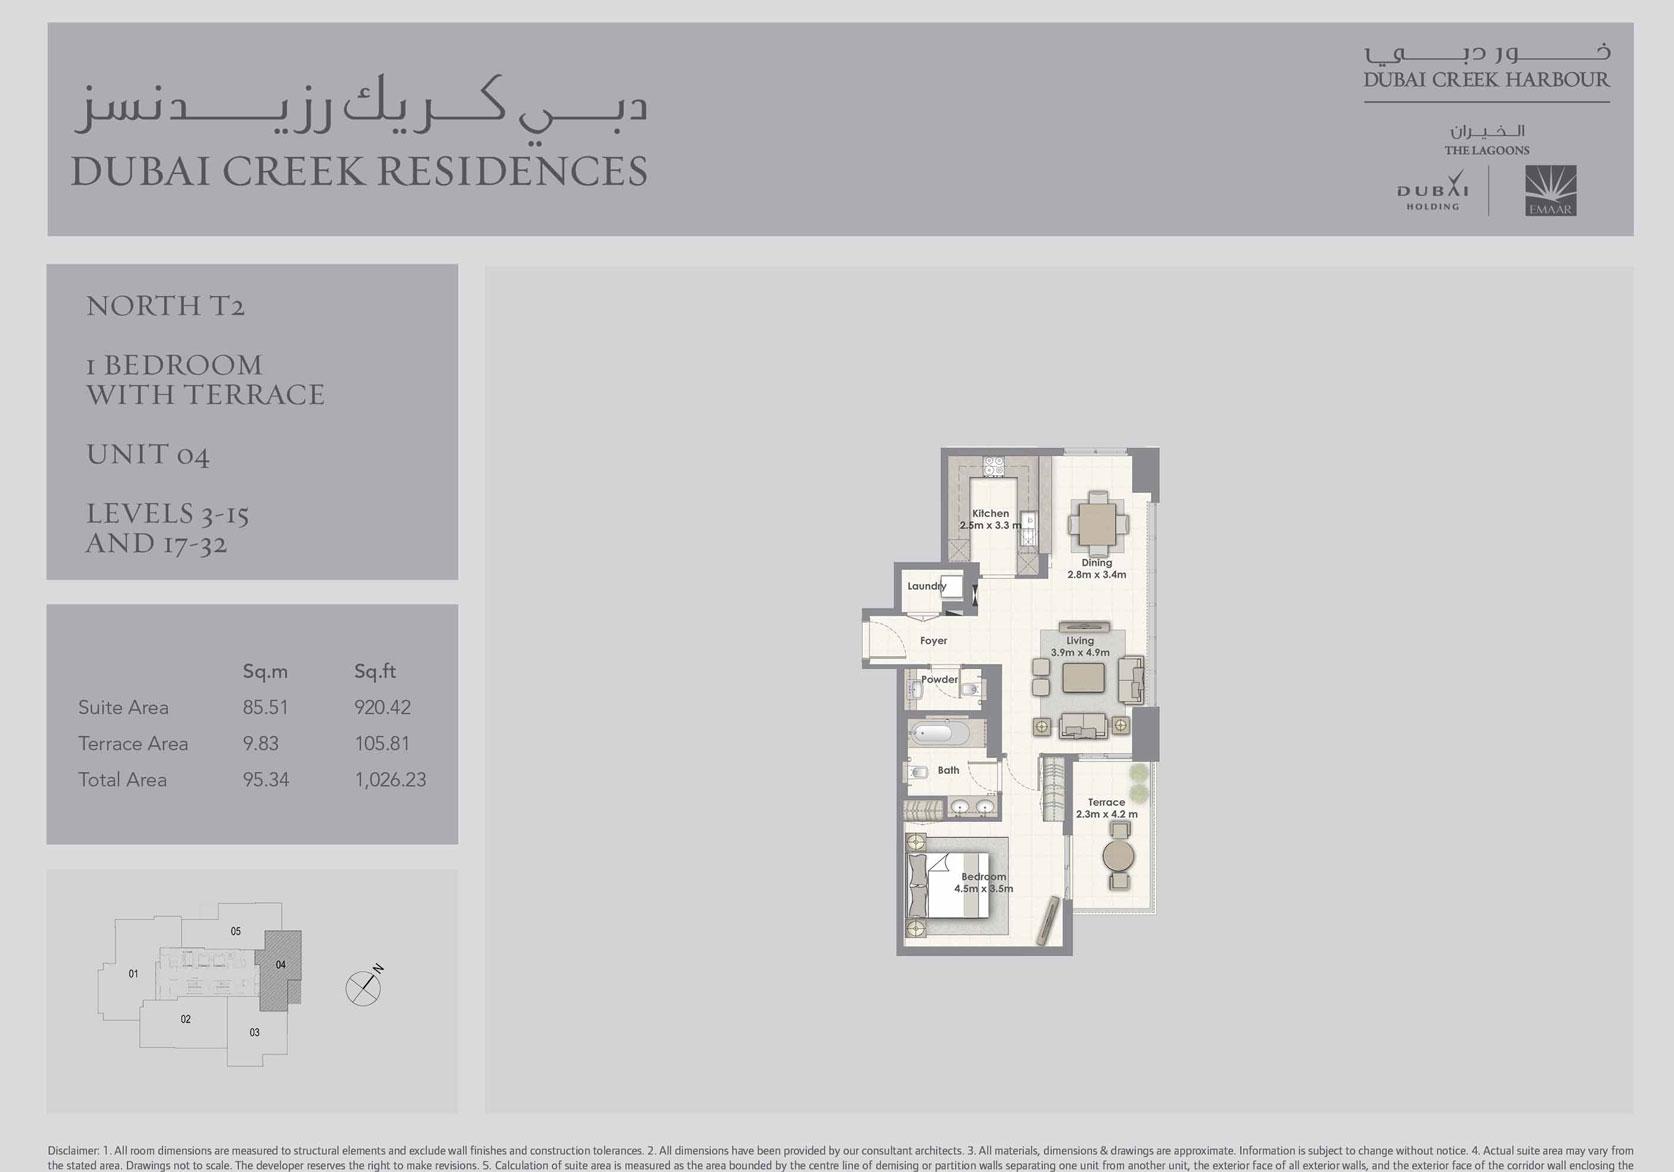 1 Bedroom with Terrace